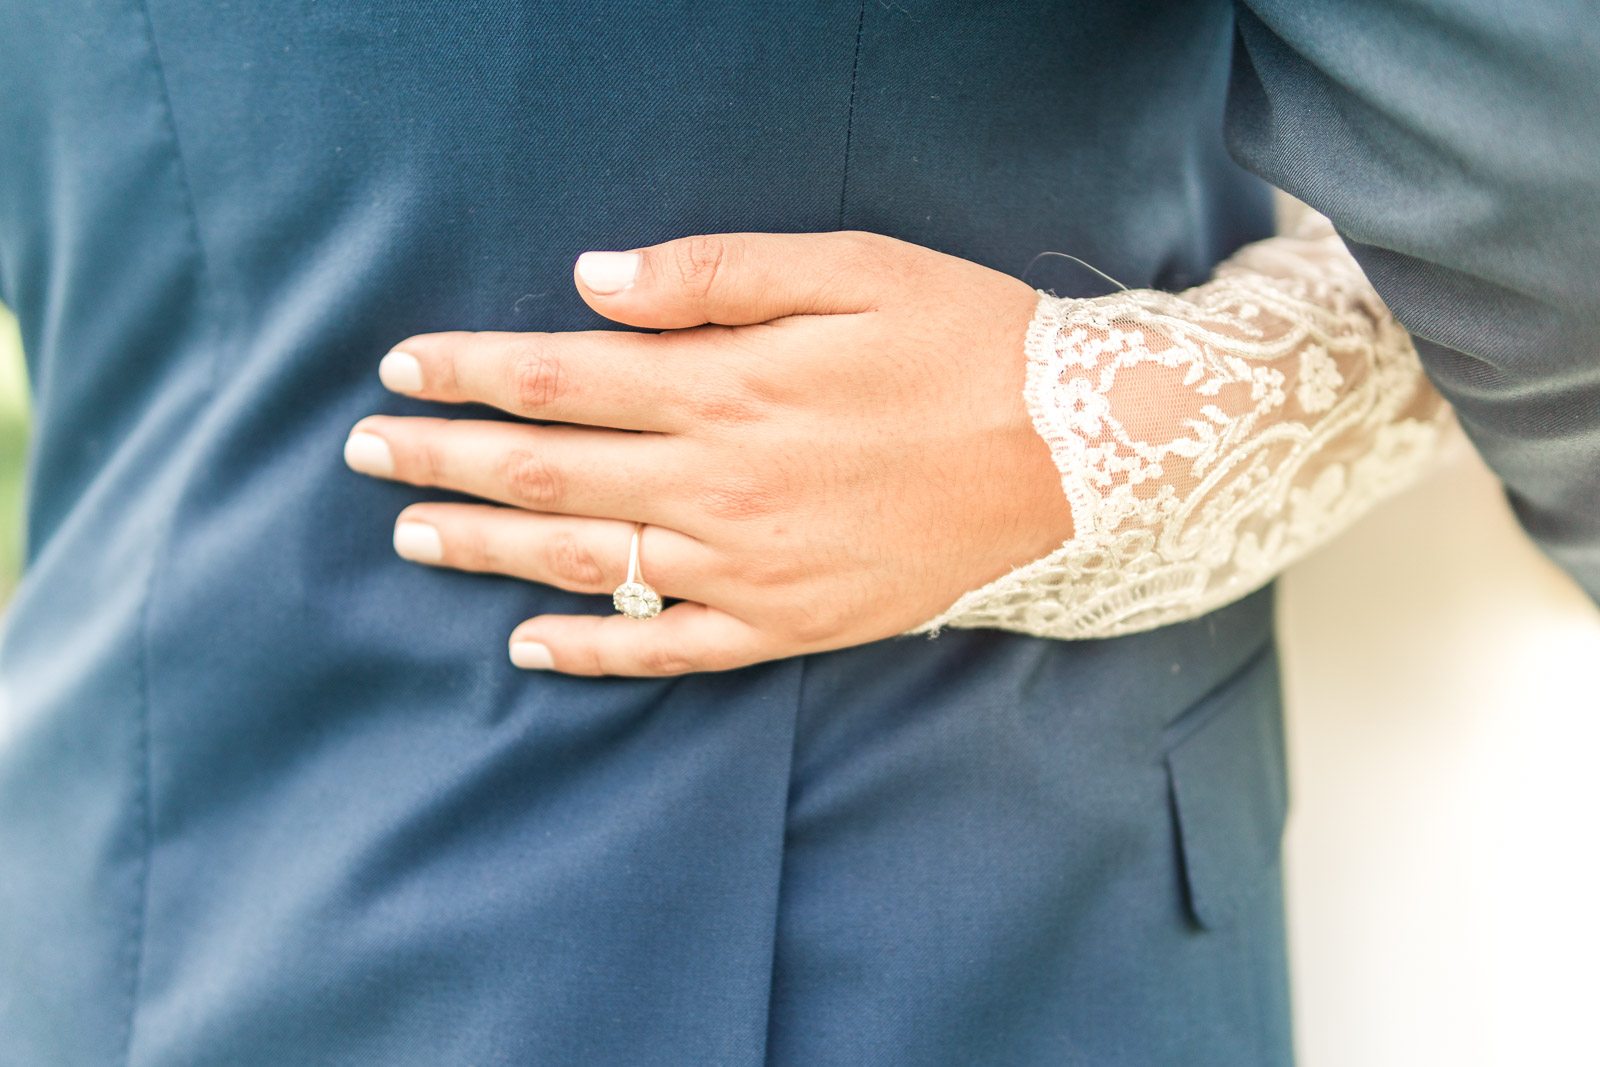 74_Angel-Brea-Orange-County_Joseph-Barber-Wedding-Photography.jpg